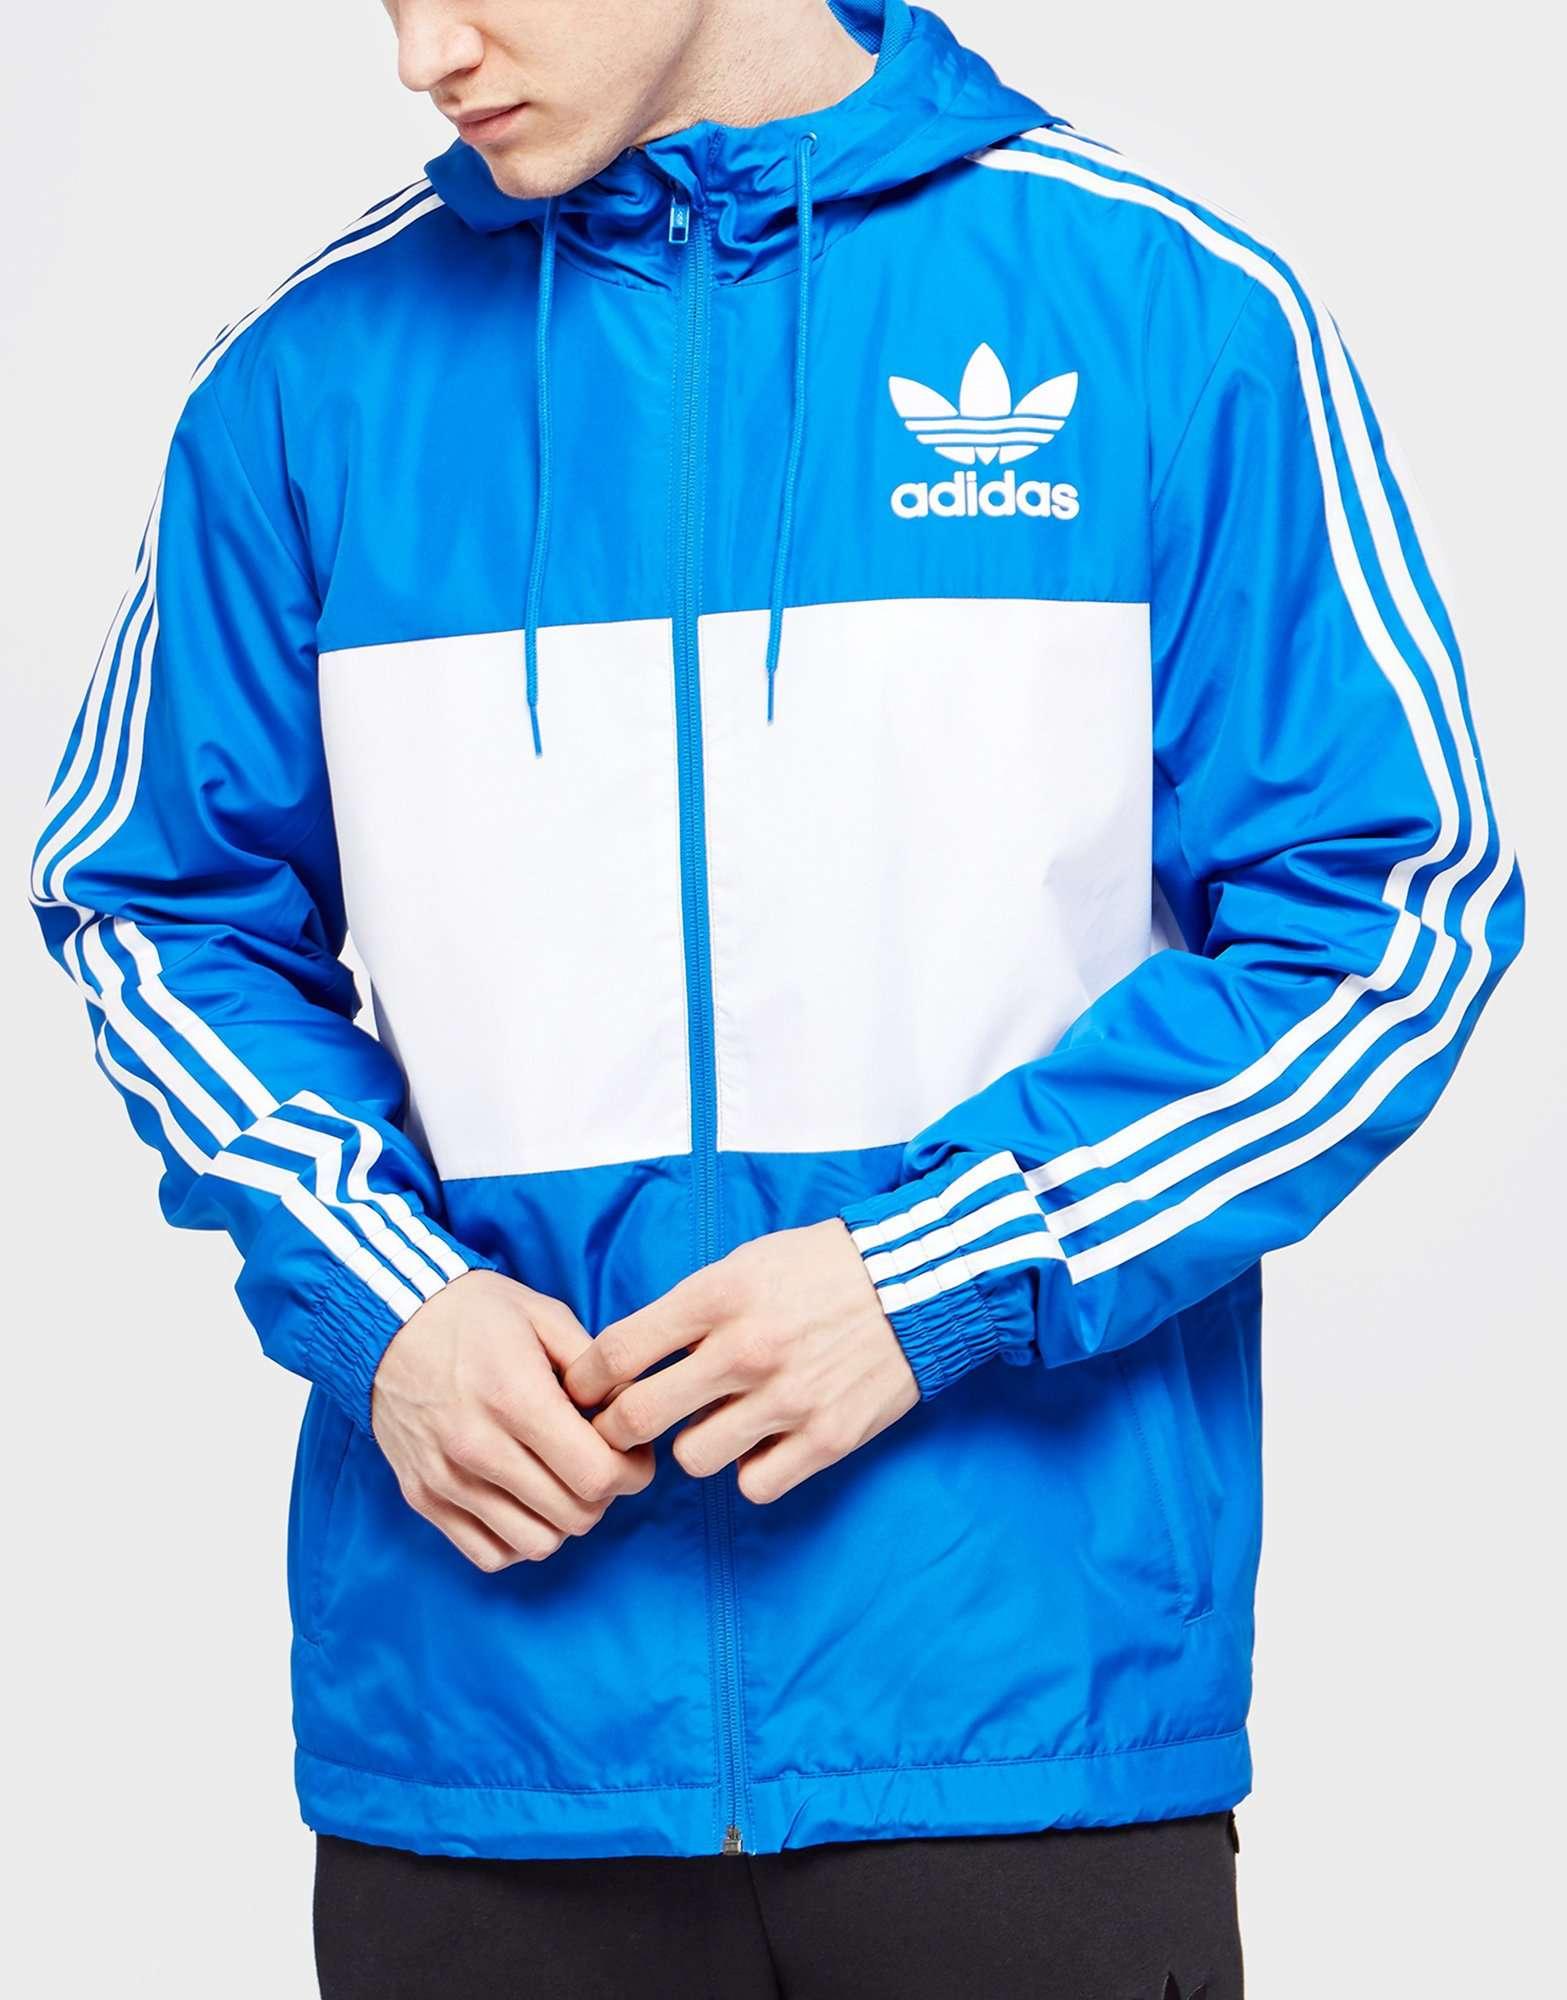 Adidas Originals California Windbreaker Jacket Scotts